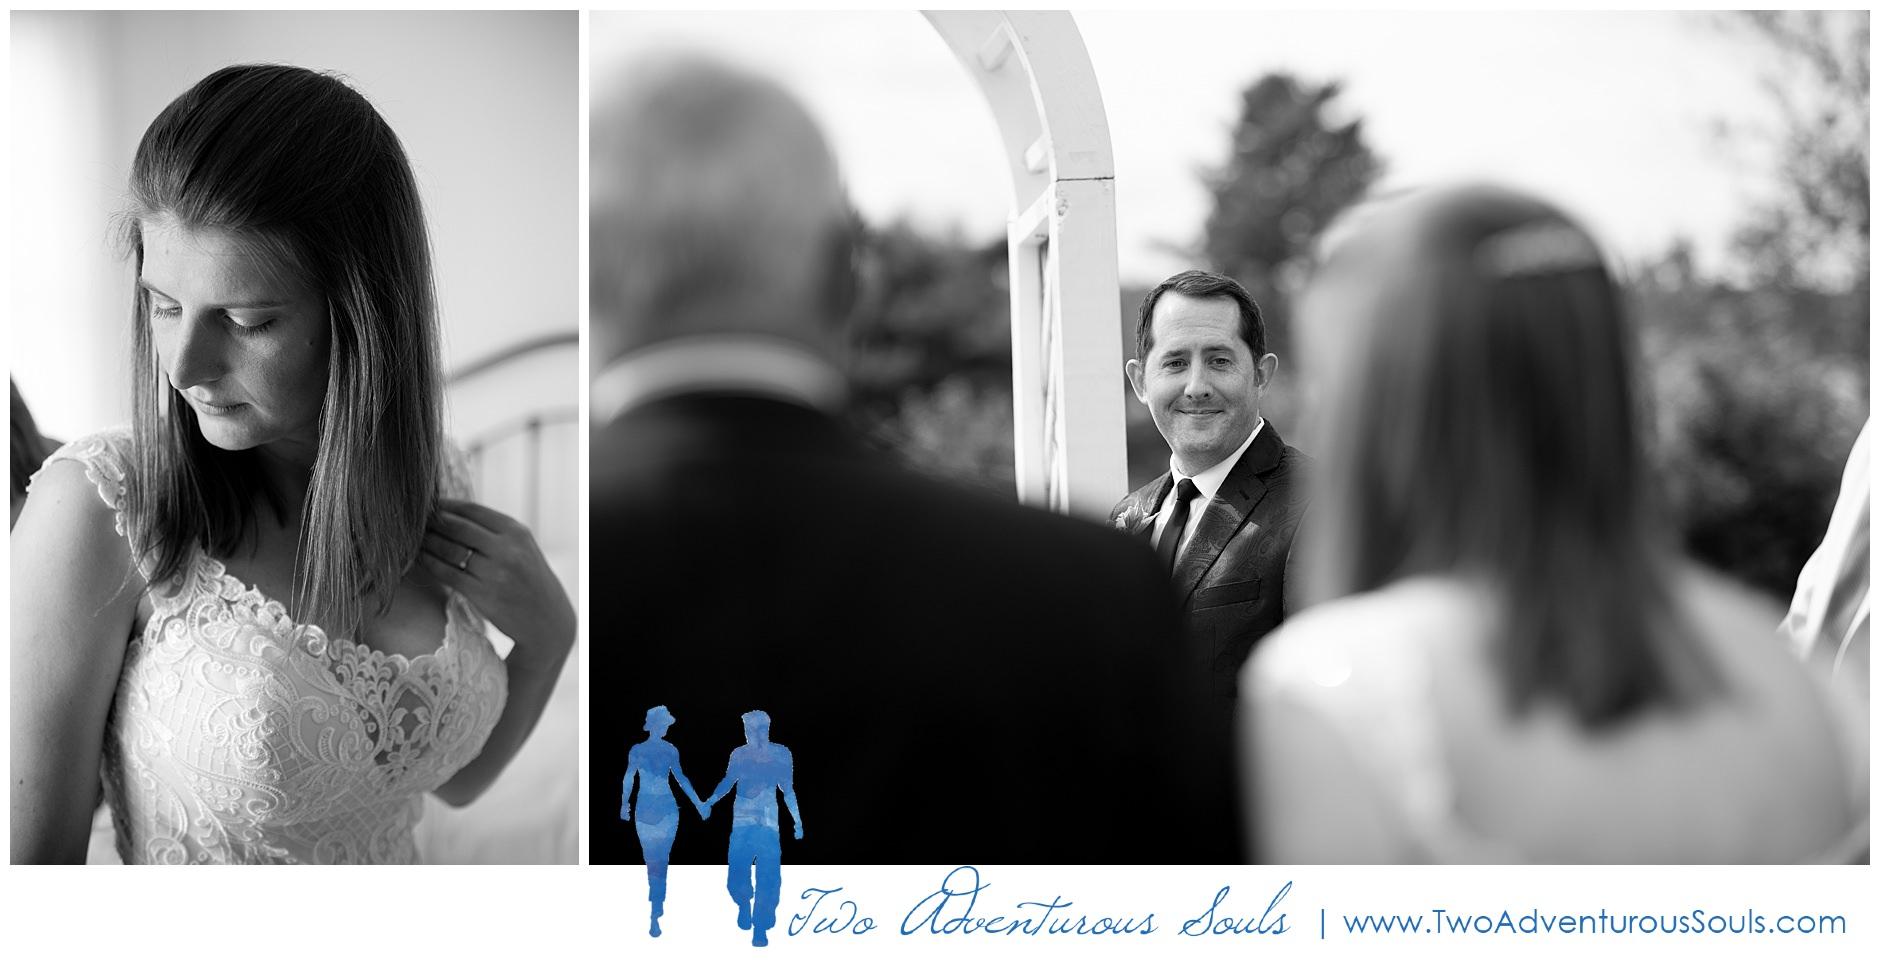 Chebeague Island Inn Wedding Photograpehrs, Maine Wedding Photographers, Two Adventurous Souls-082419_0004.jpg